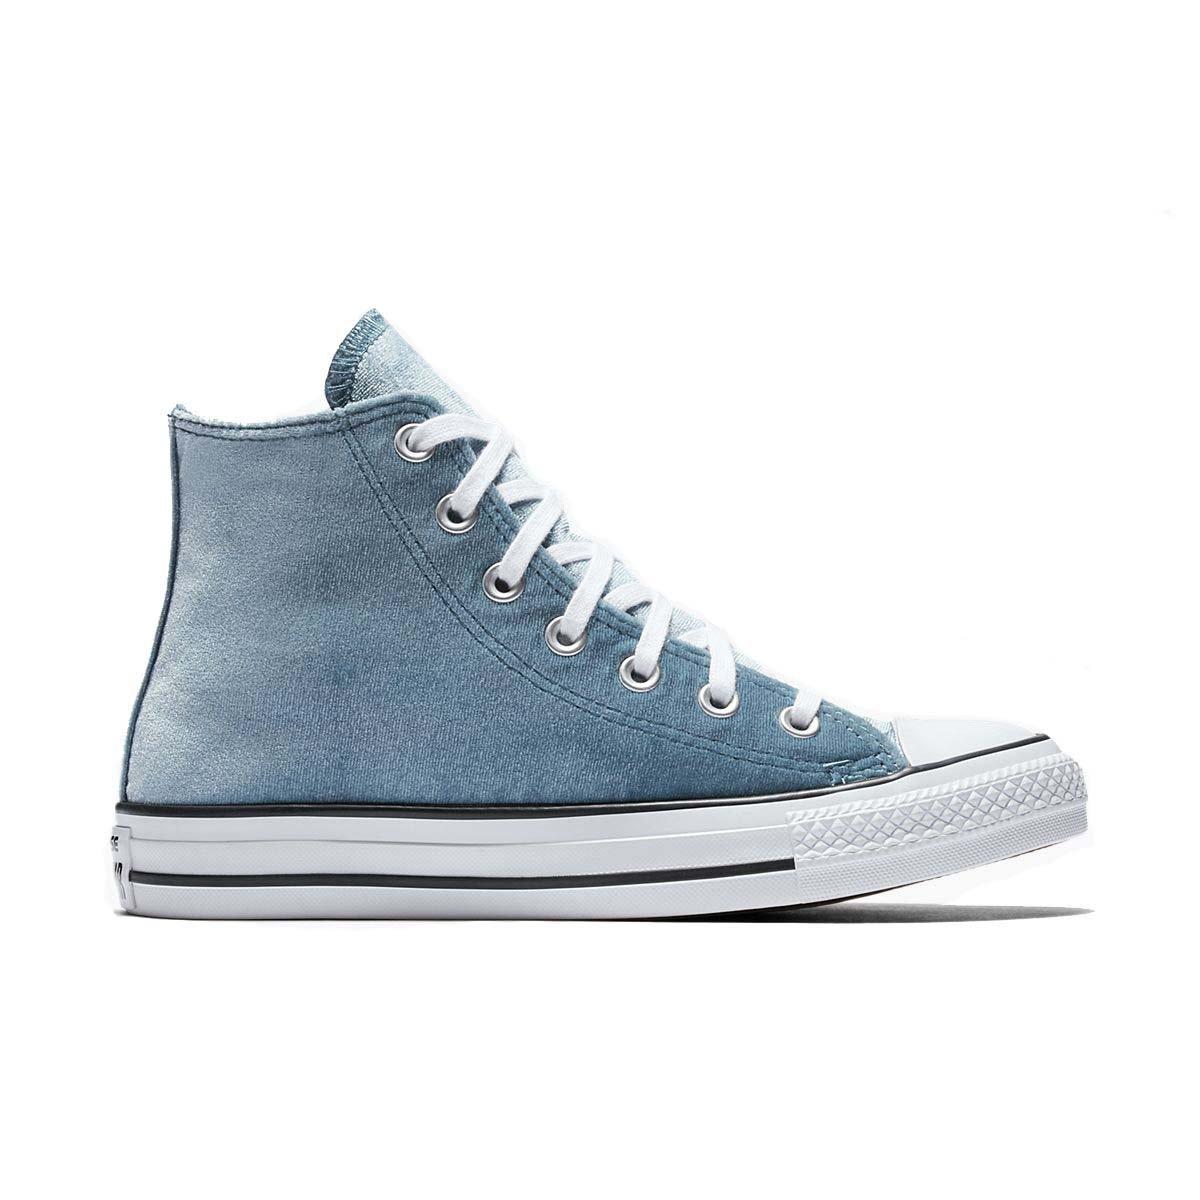 Converse CTAS Hi Femme, Bleu (Bleu SarcelleBlanc), 38 EU